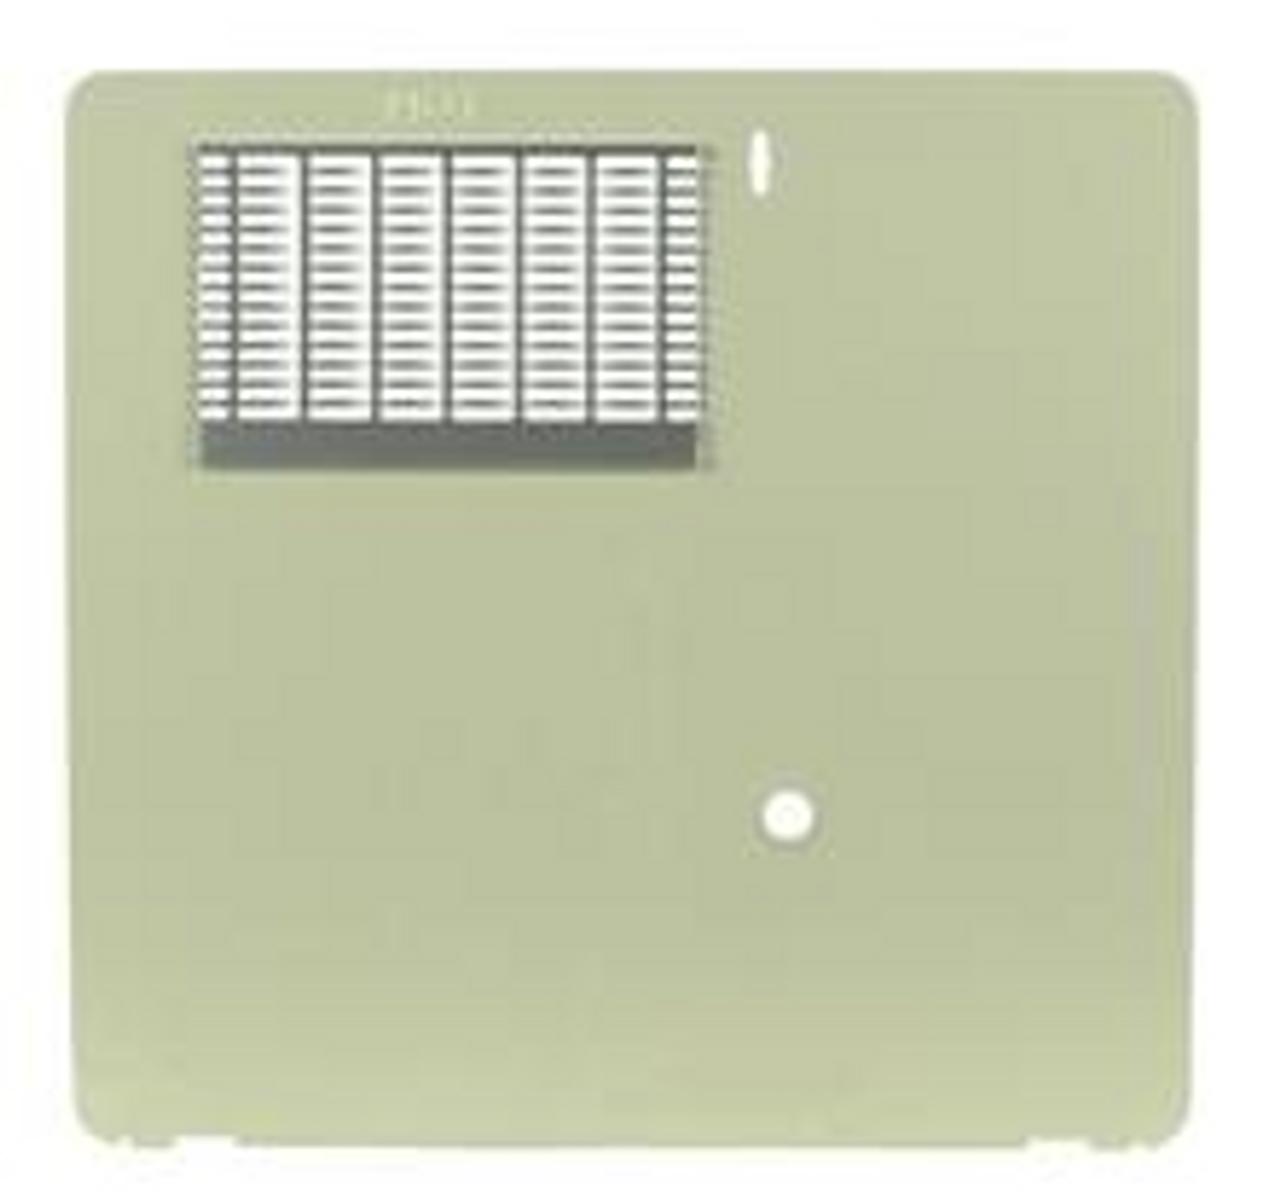 DOMETIC (WAS ATWOOD) 10 GALLON WATER HEATER DOOR (09-1020)